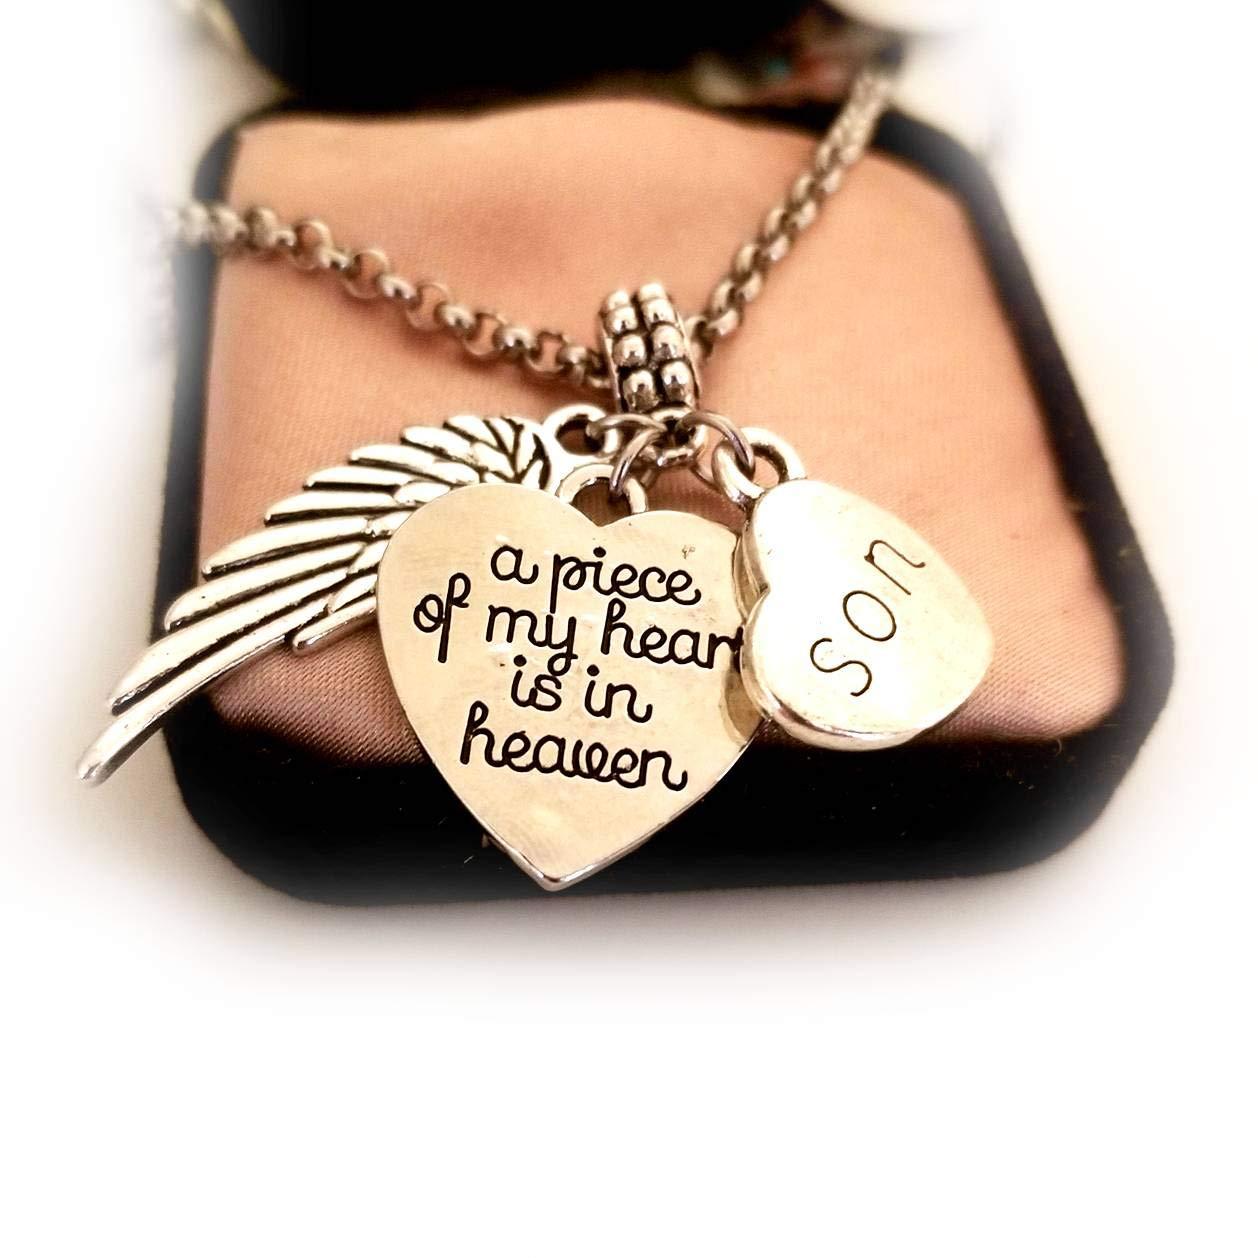 Son Seasonal Wrap Introduction Memorial Selling rankings Gifts Keepsake Charm with Keycha Bracelet Necklace